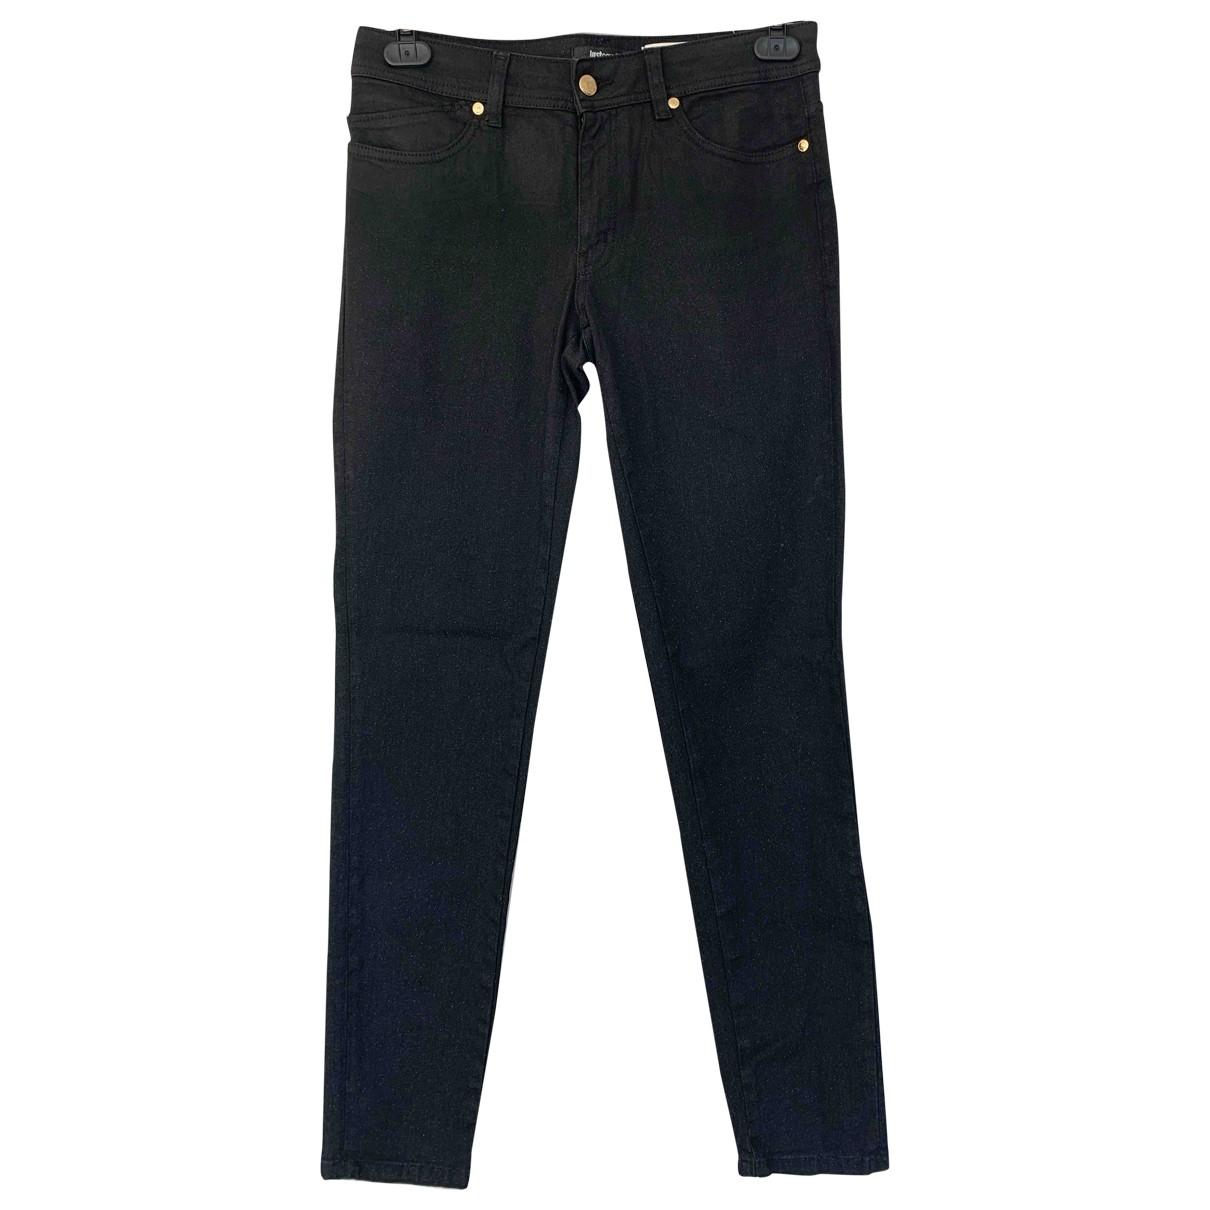 Just Cavalli \N Black Cotton - elasthane Jeans for Women 29 US